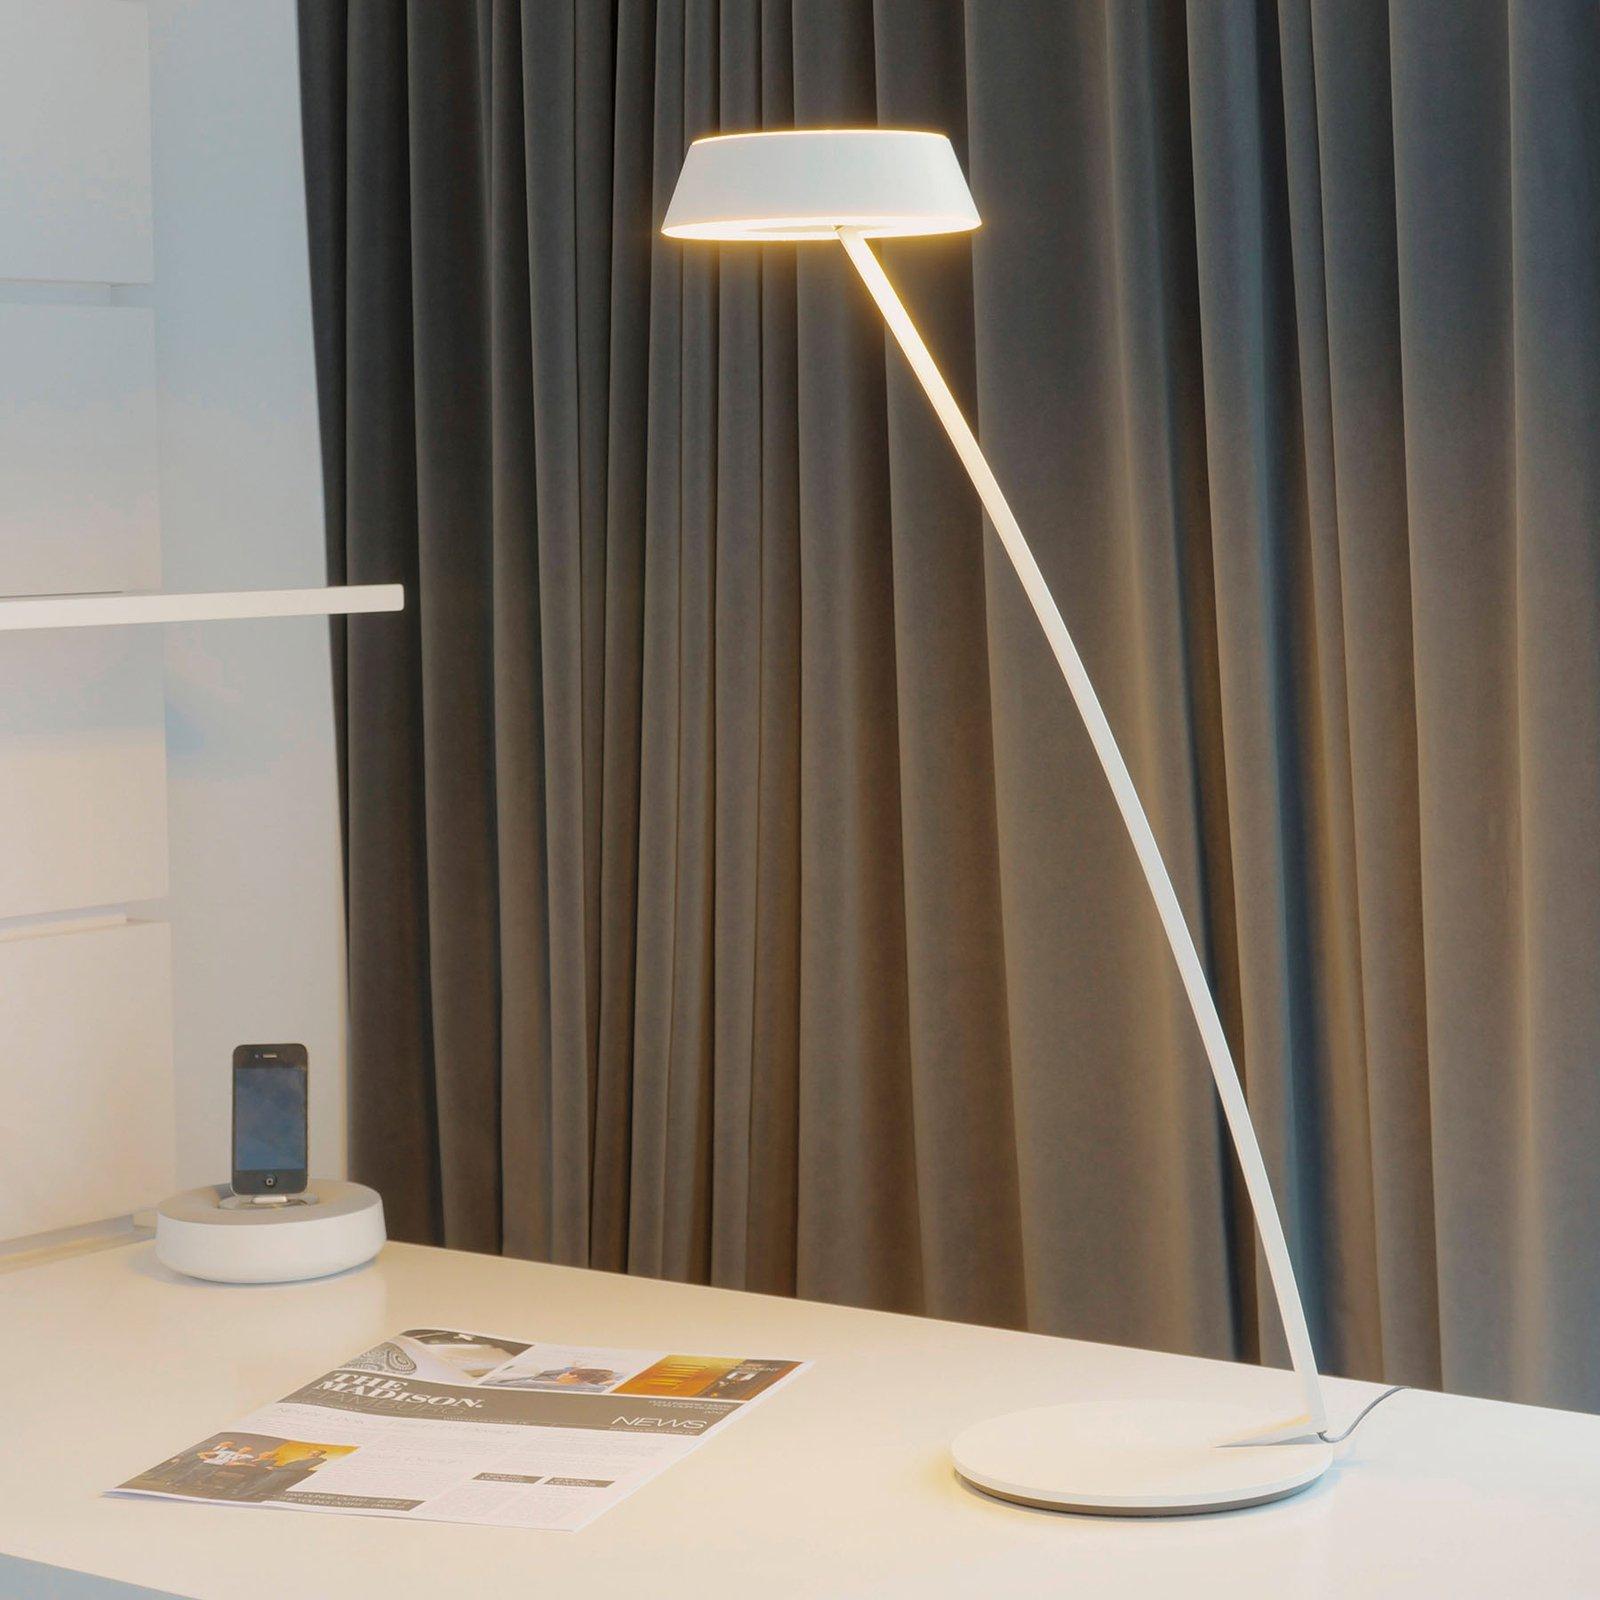 OLIGO Glance LED-bordlampe bøyd, hvit matt